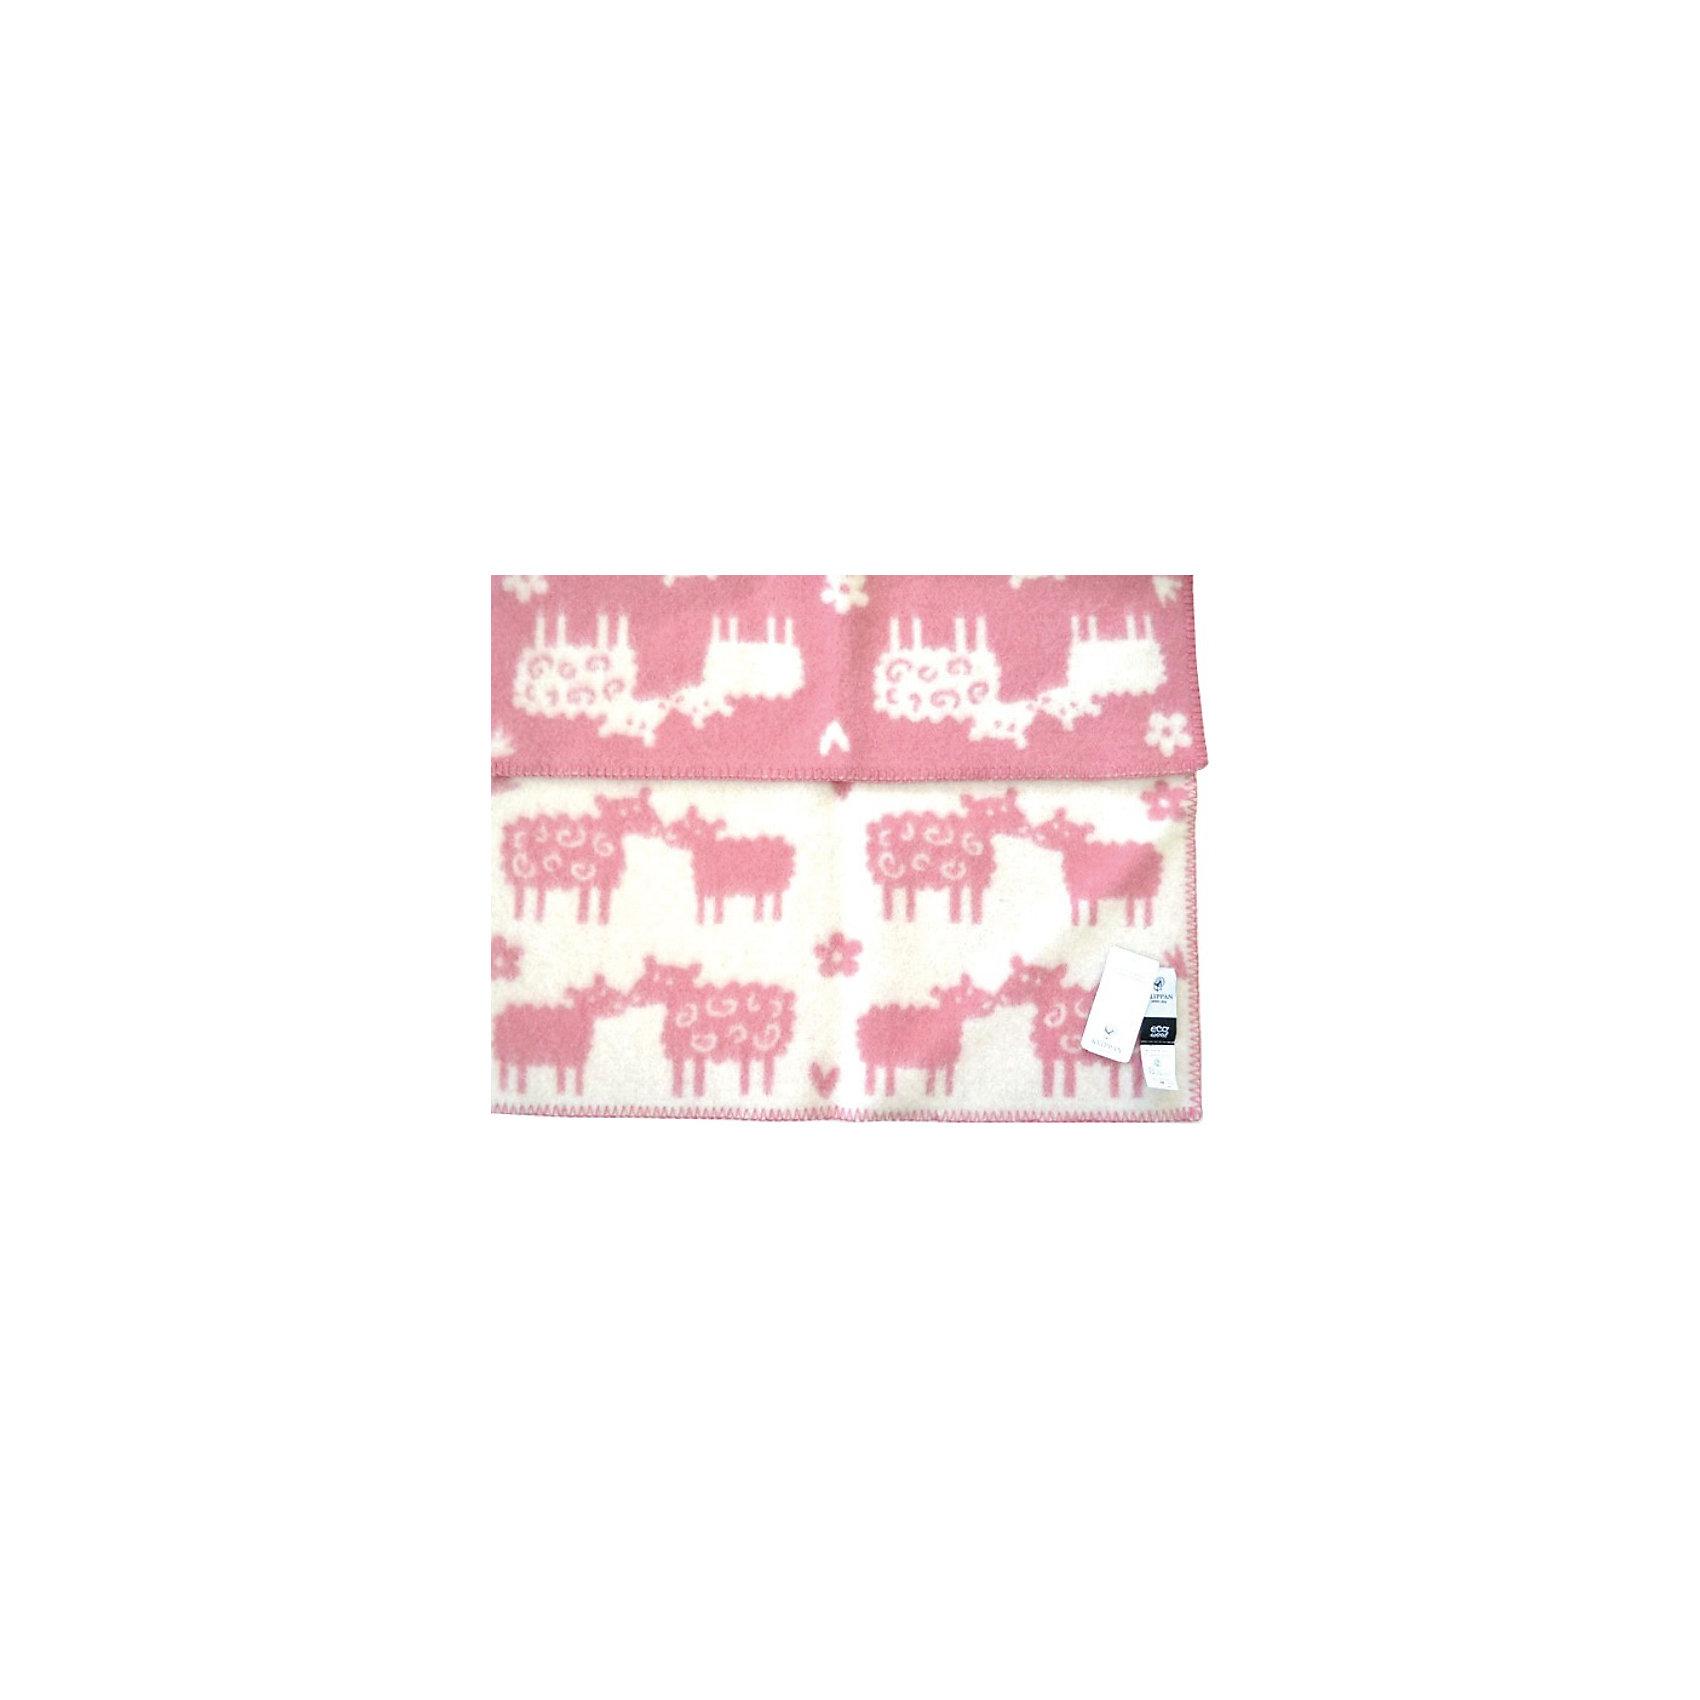 Одеяло-плед из эко-шерсти Овечки 65х90, Klippan, розовый/белый